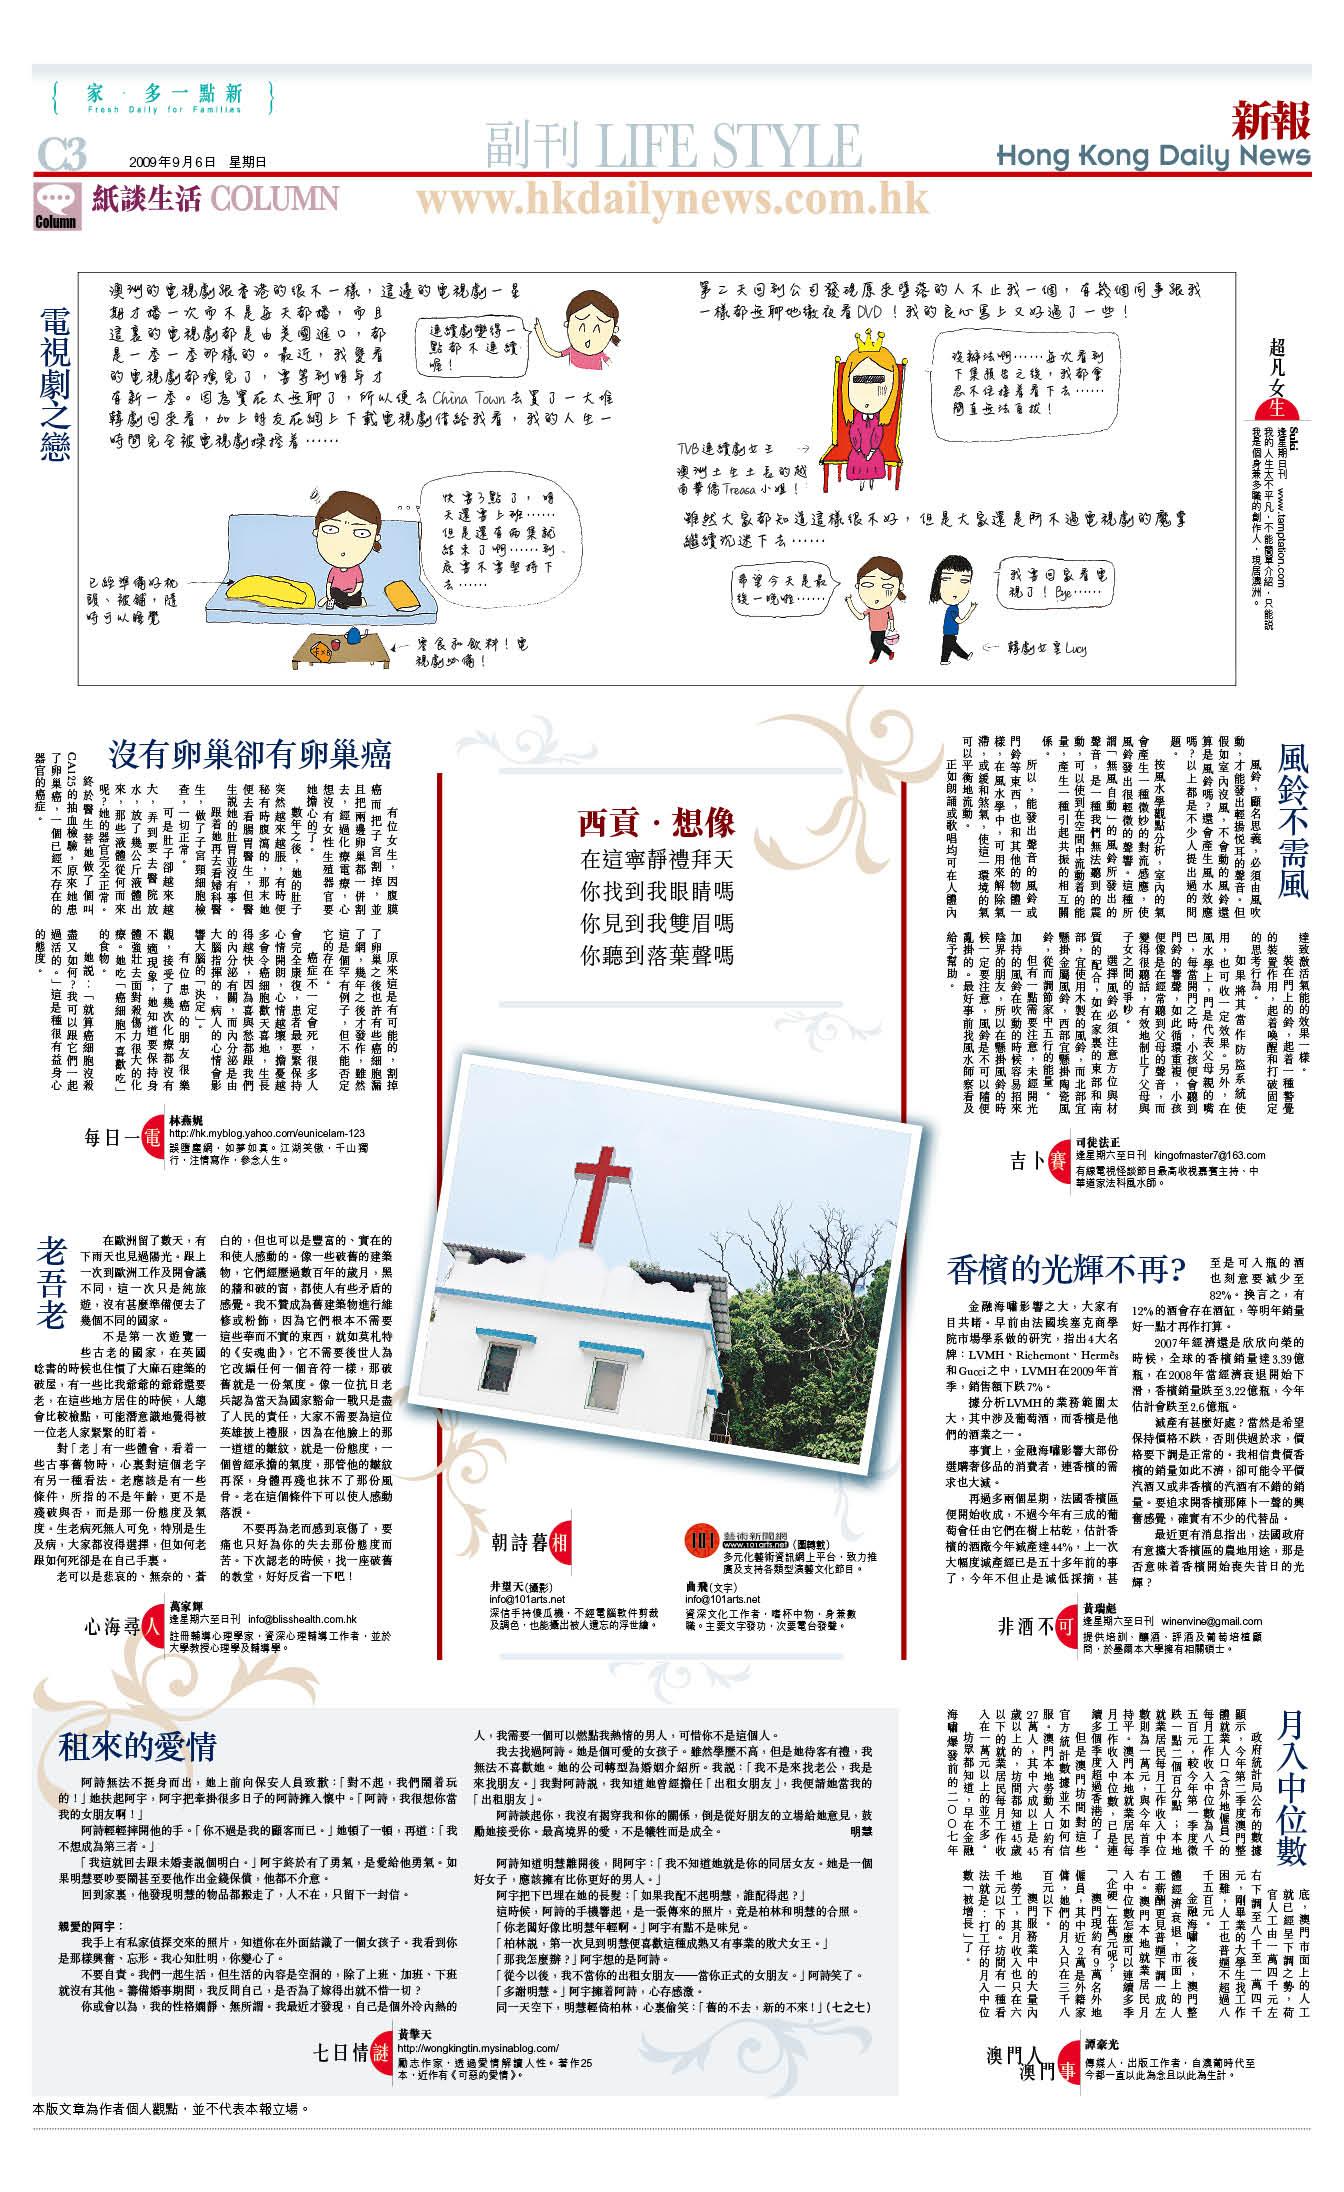 my newspaper column